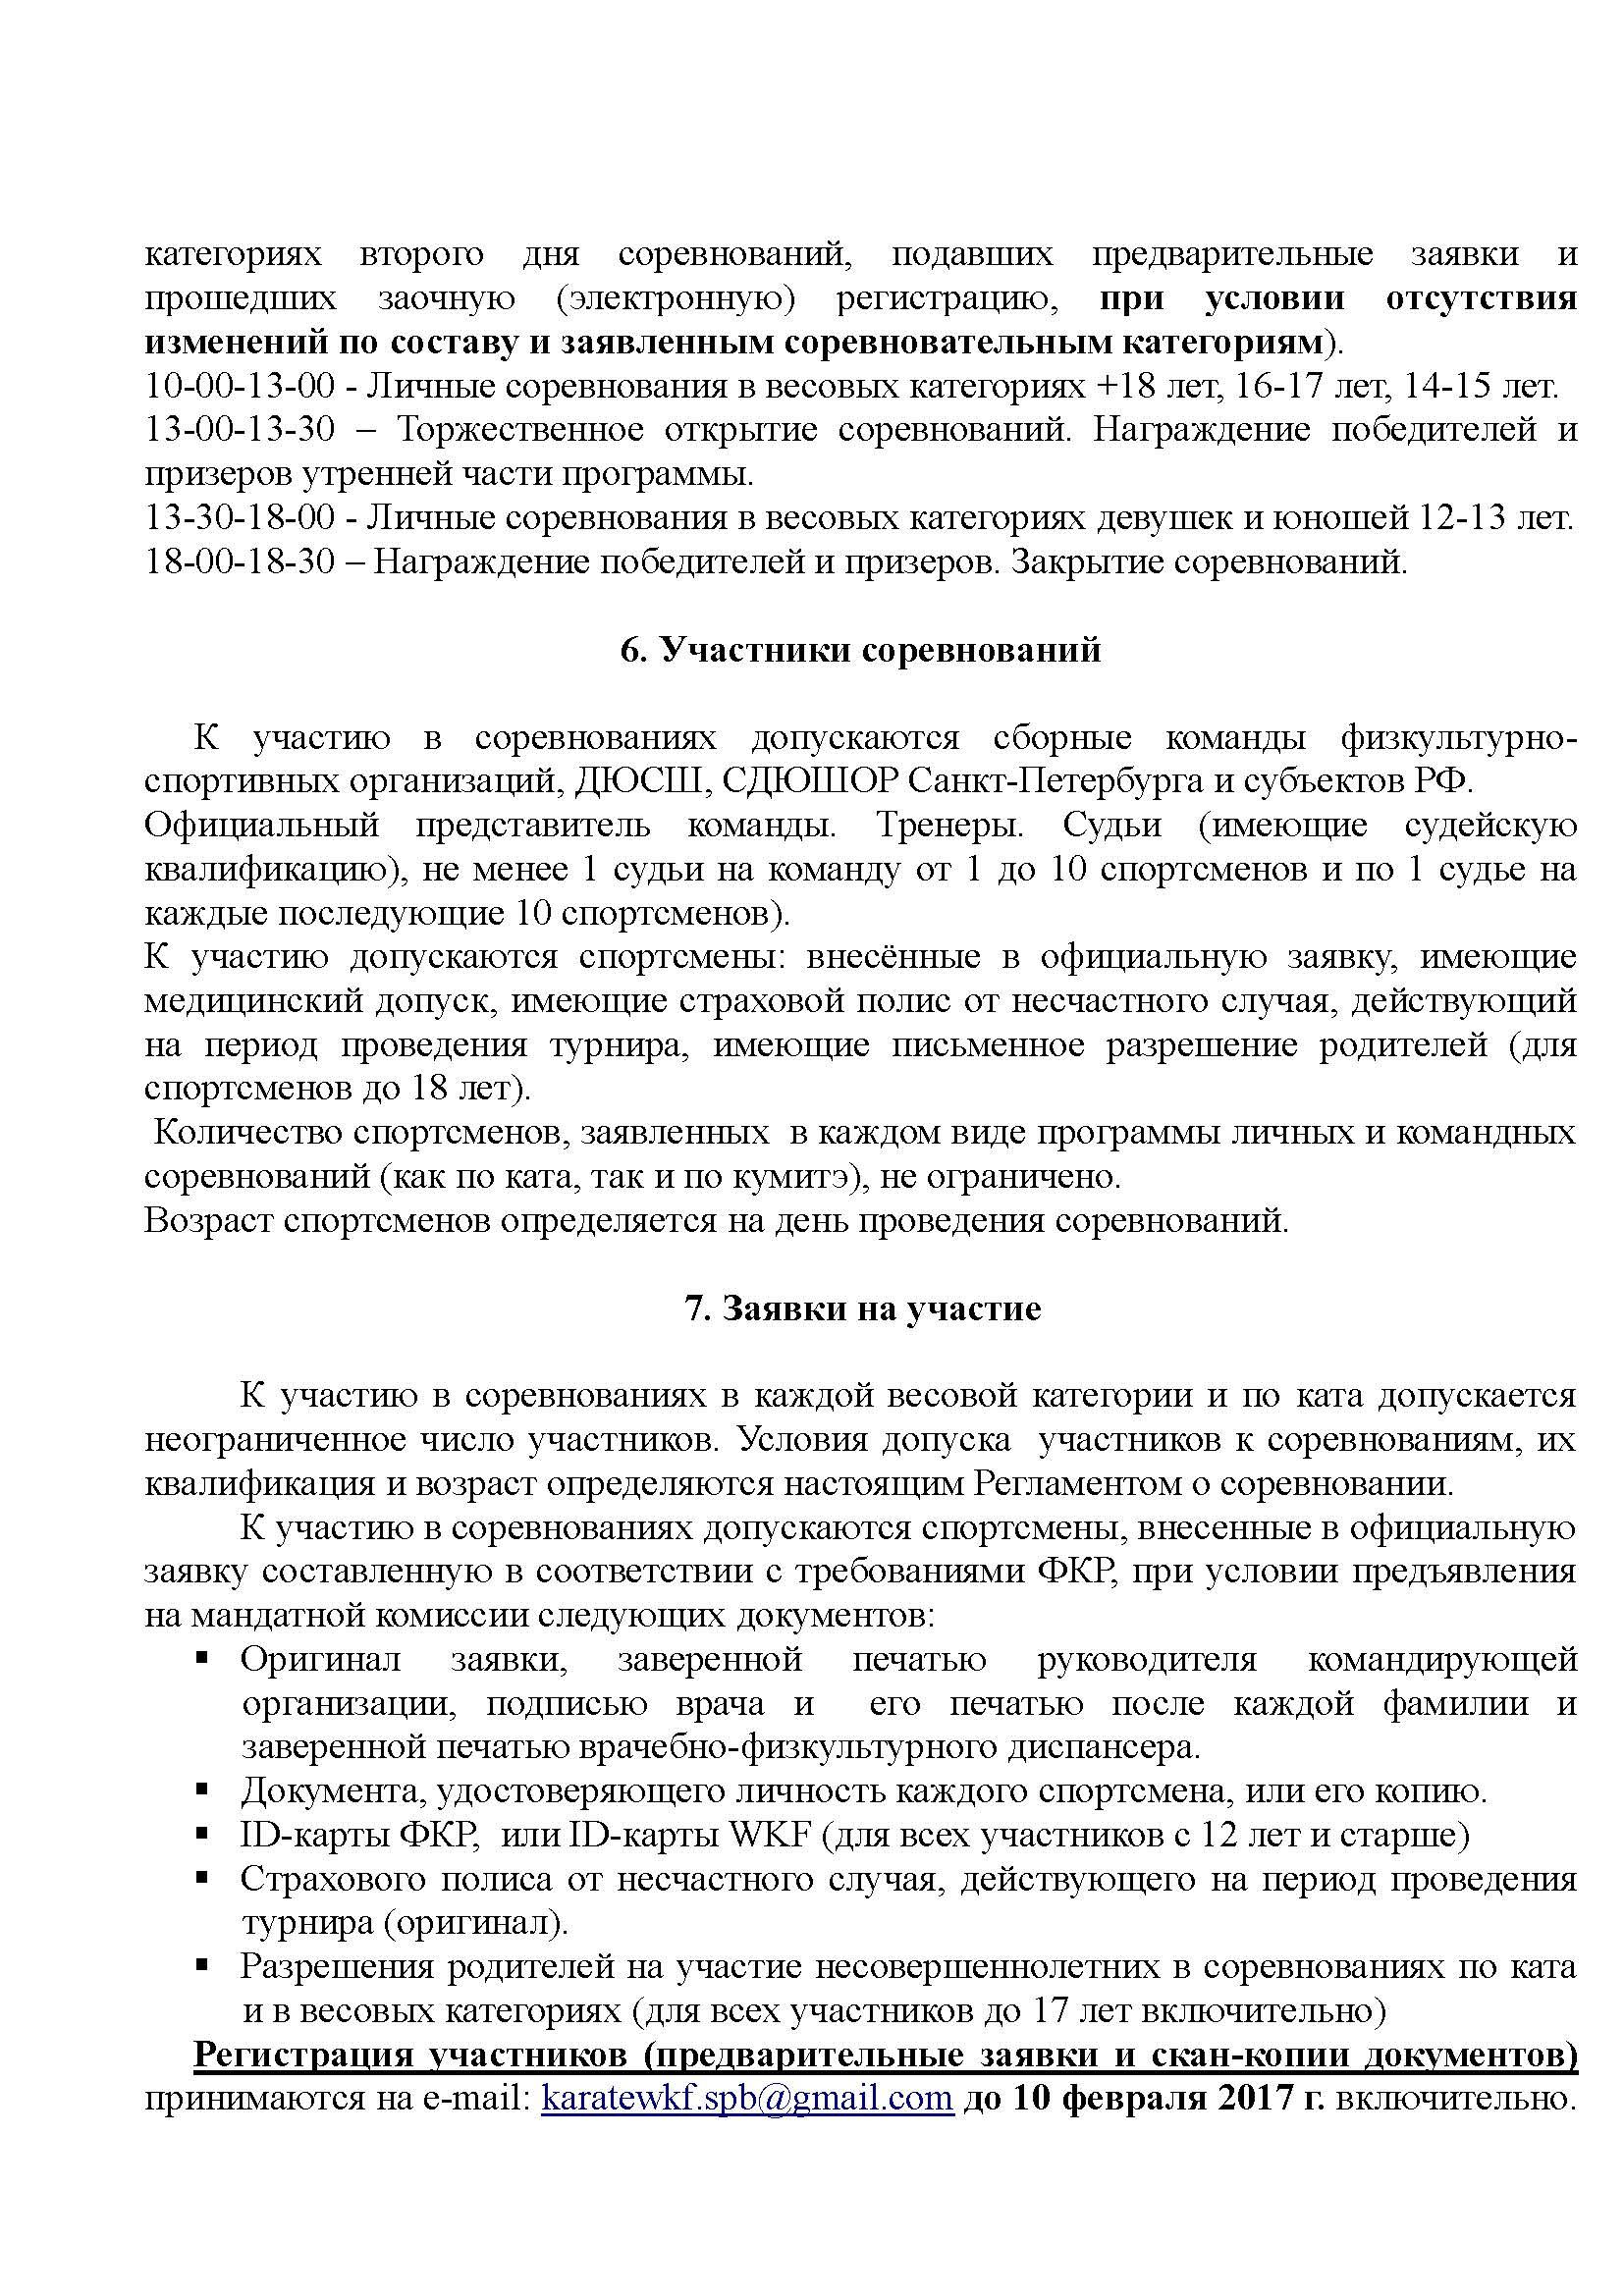 PS-2017-001-ВС_Страница_4